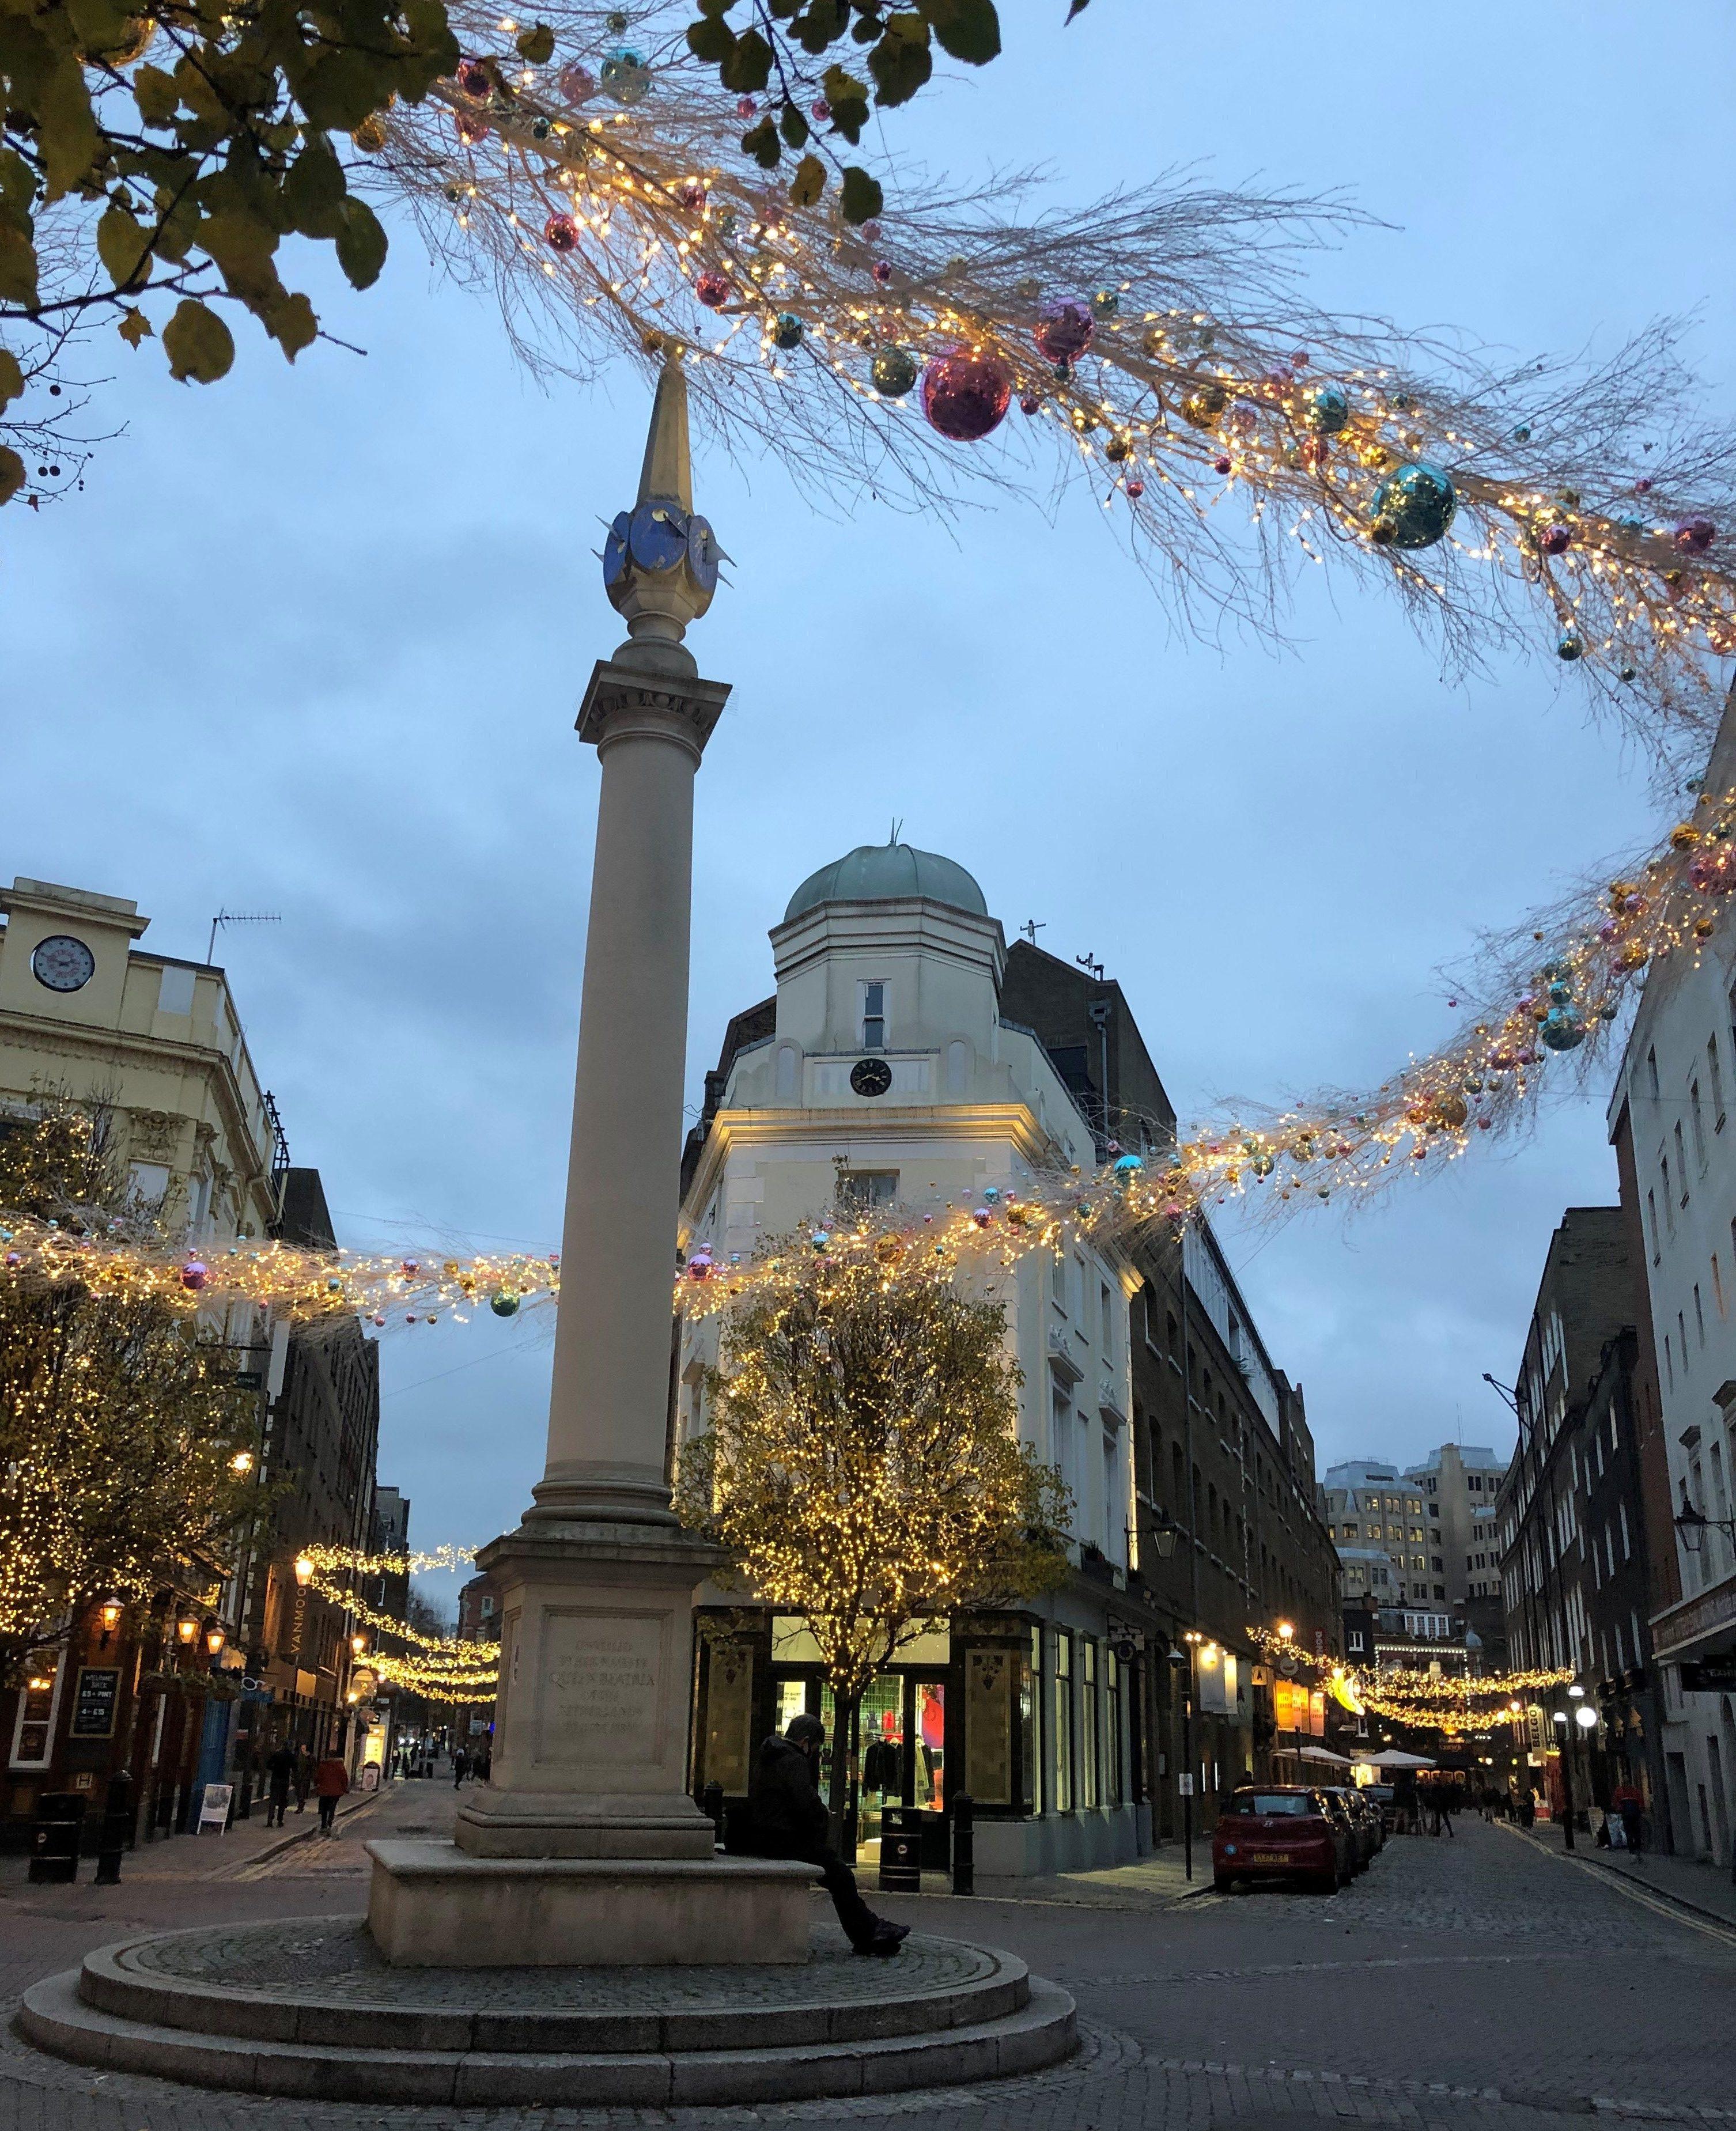 Covent Garden - Seven Dials at Christmas